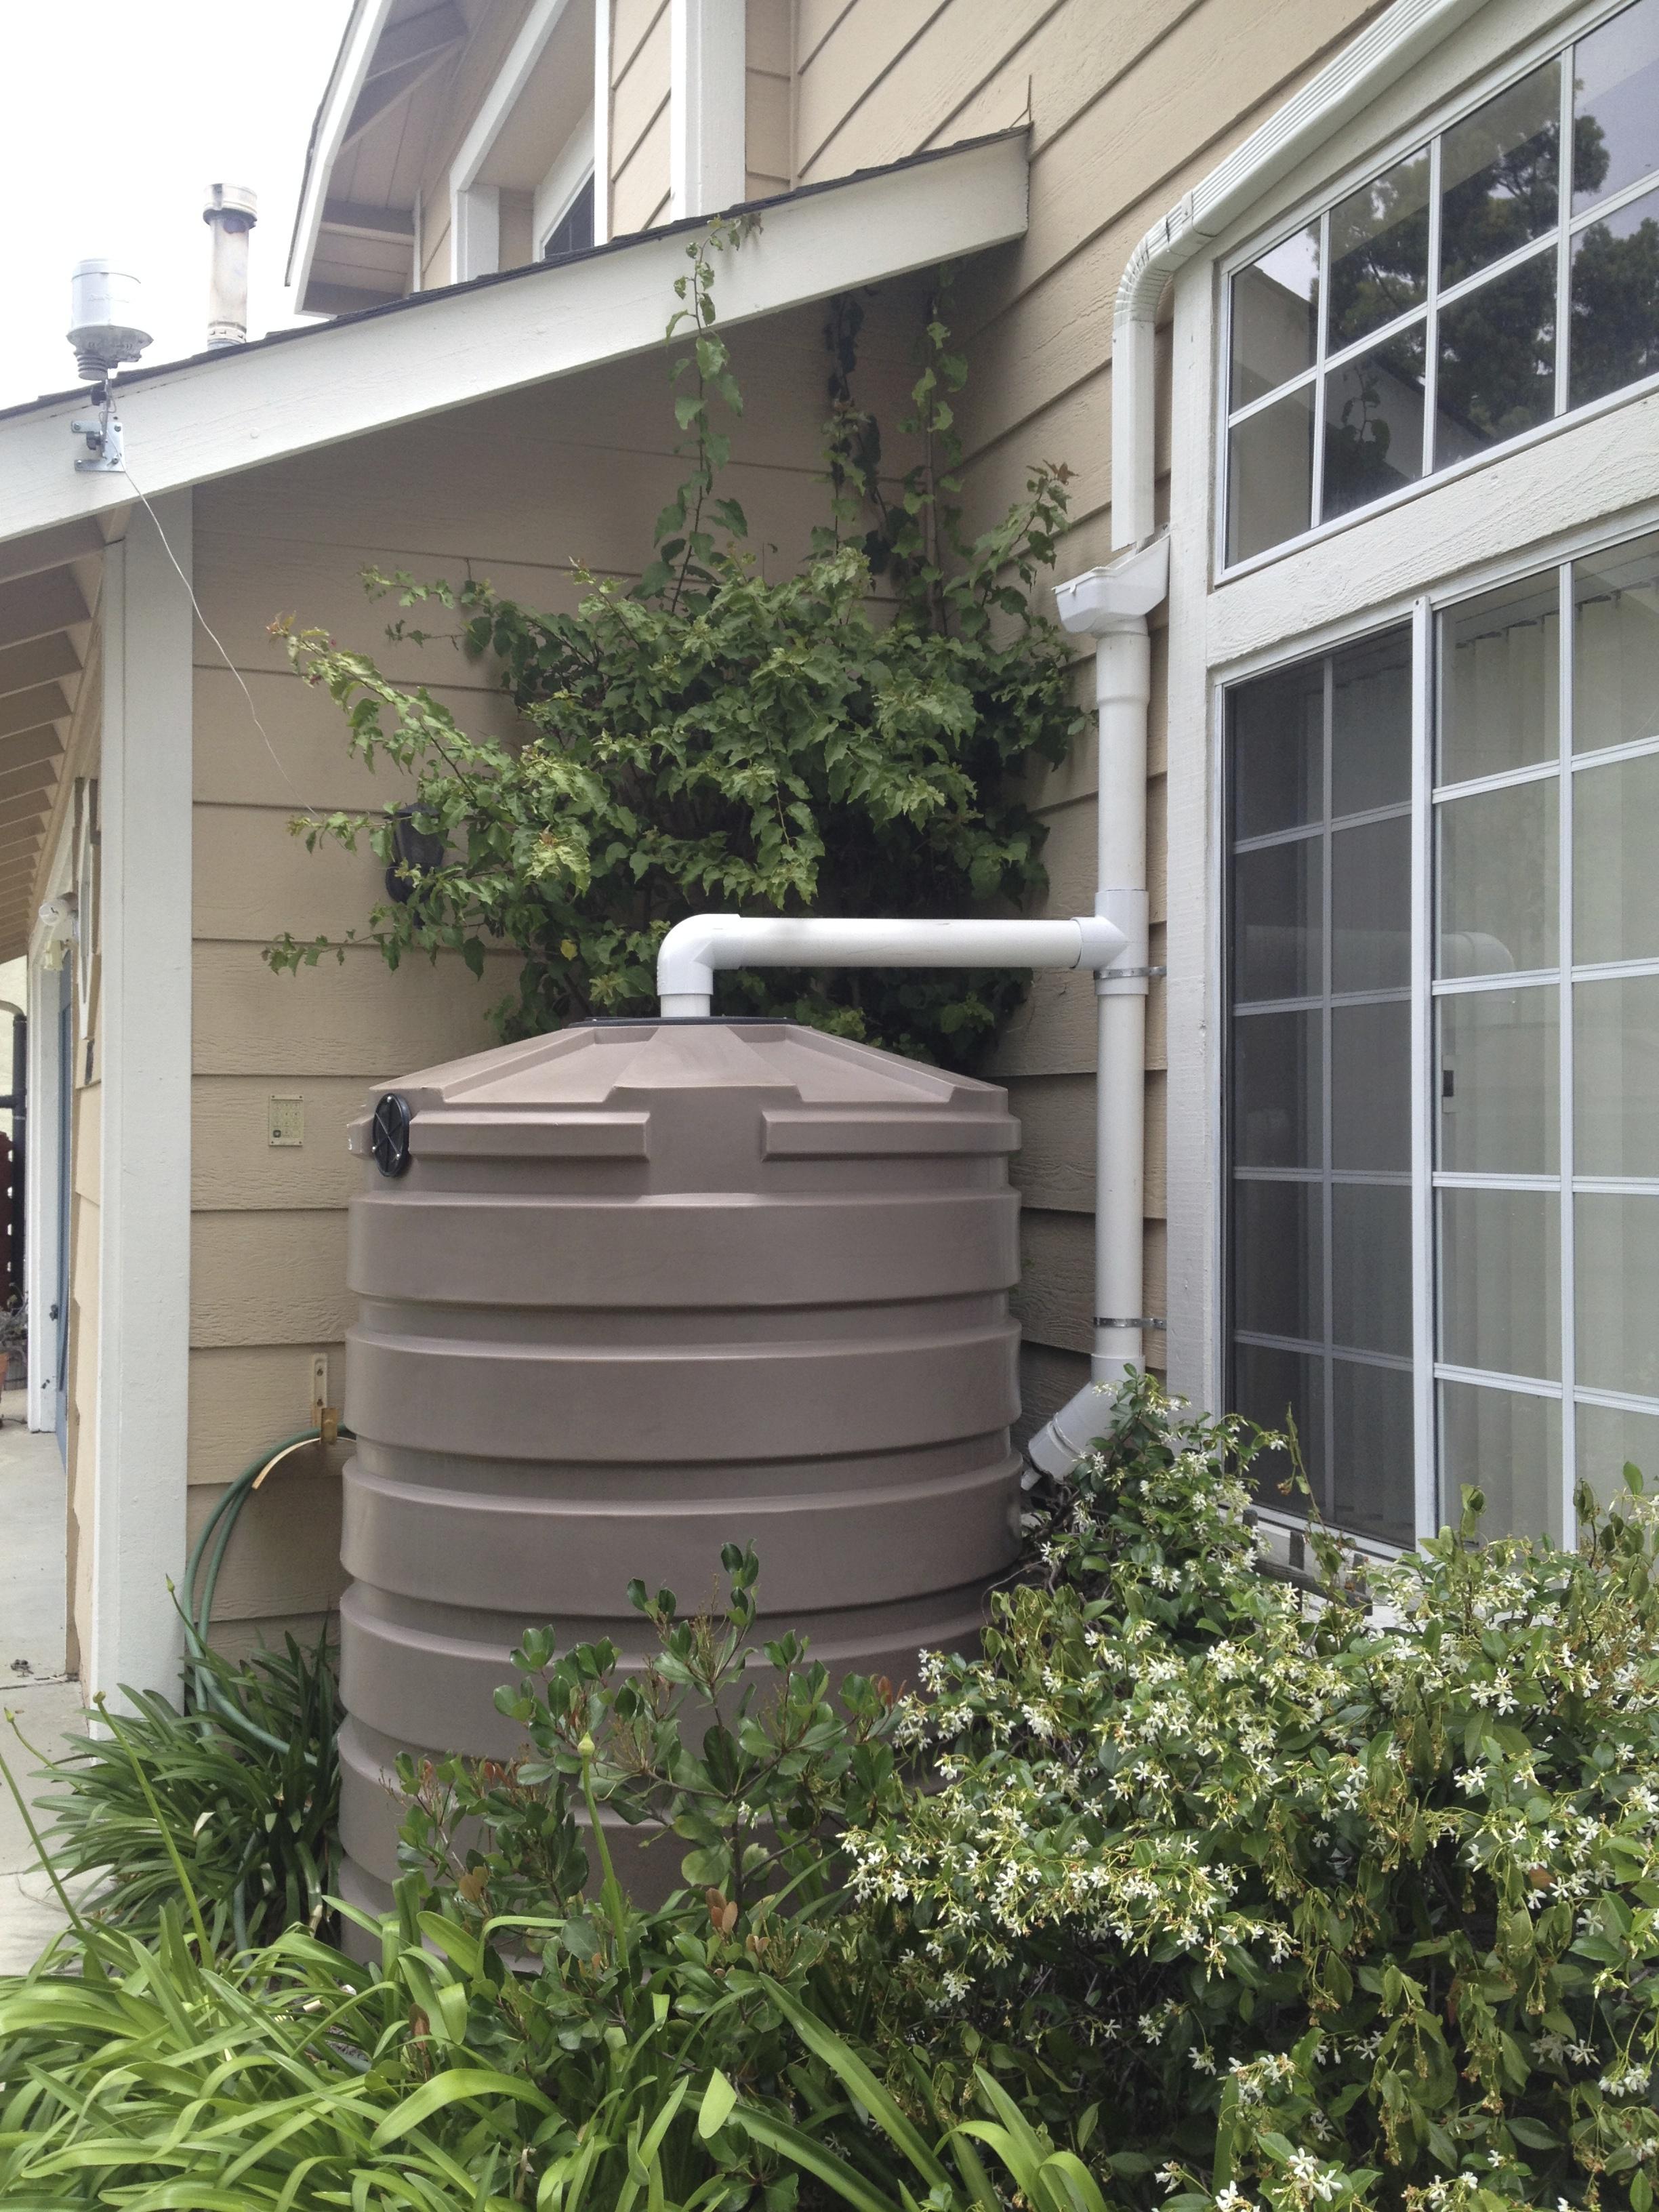 420 gallon Bushman Rainwater Tank